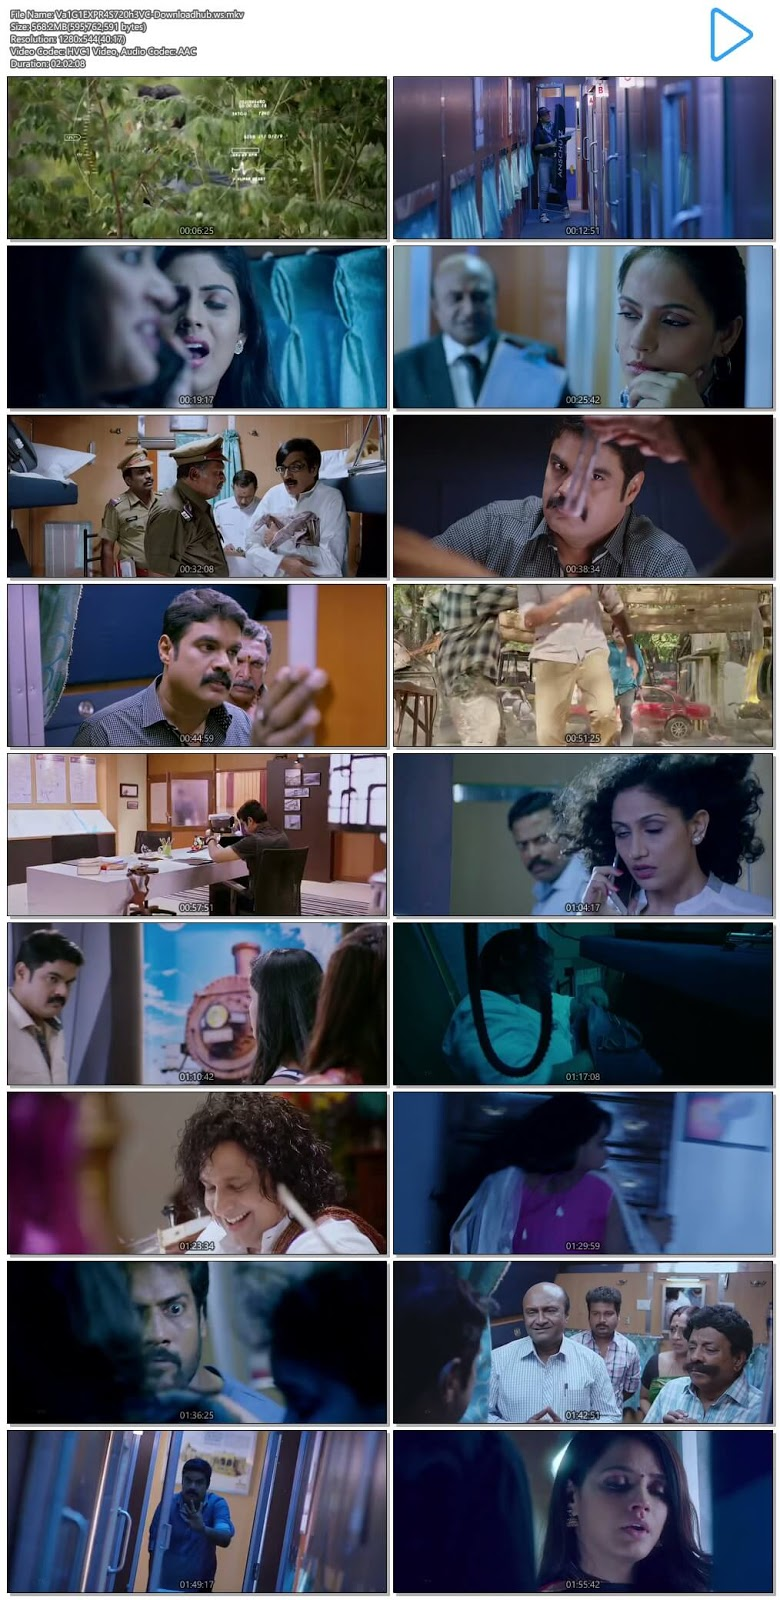 Vaigai Express 2017 UNCUT Hindi Dual Audio 720p HEVC HDRip Free Download